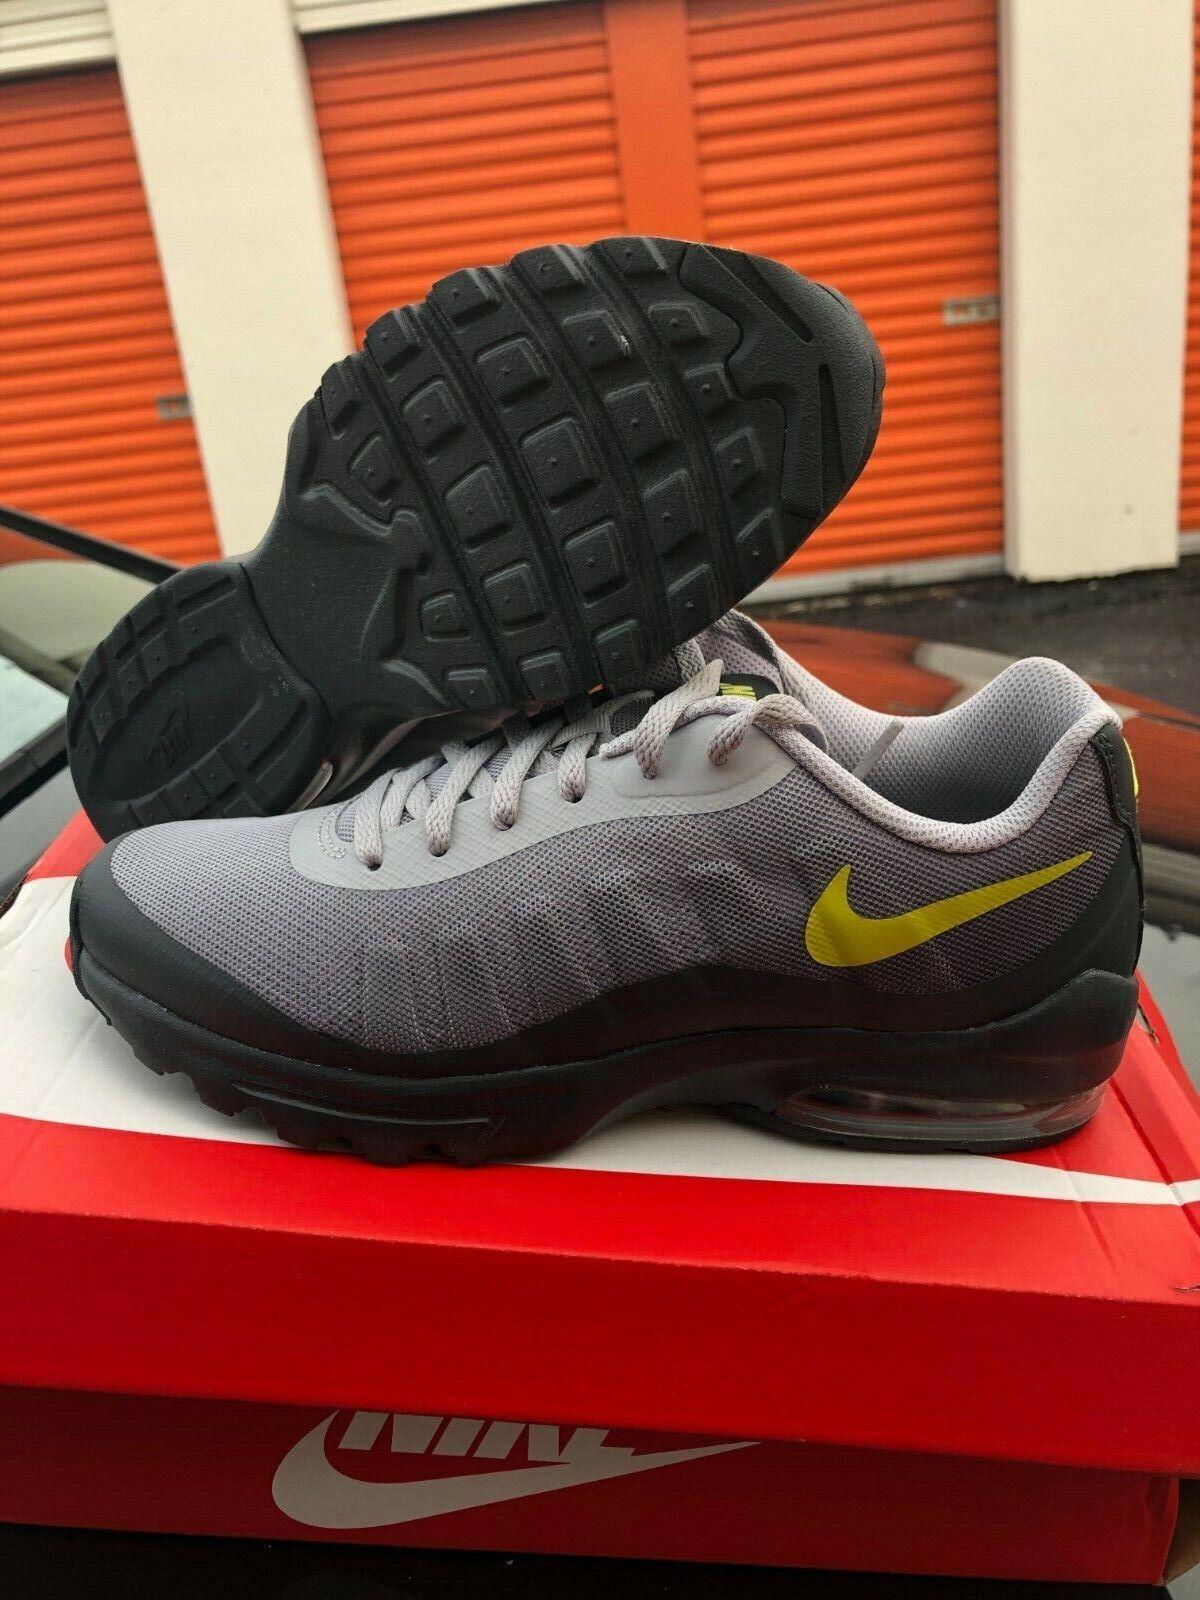 Nike Air Max Invigor Print 749688-004